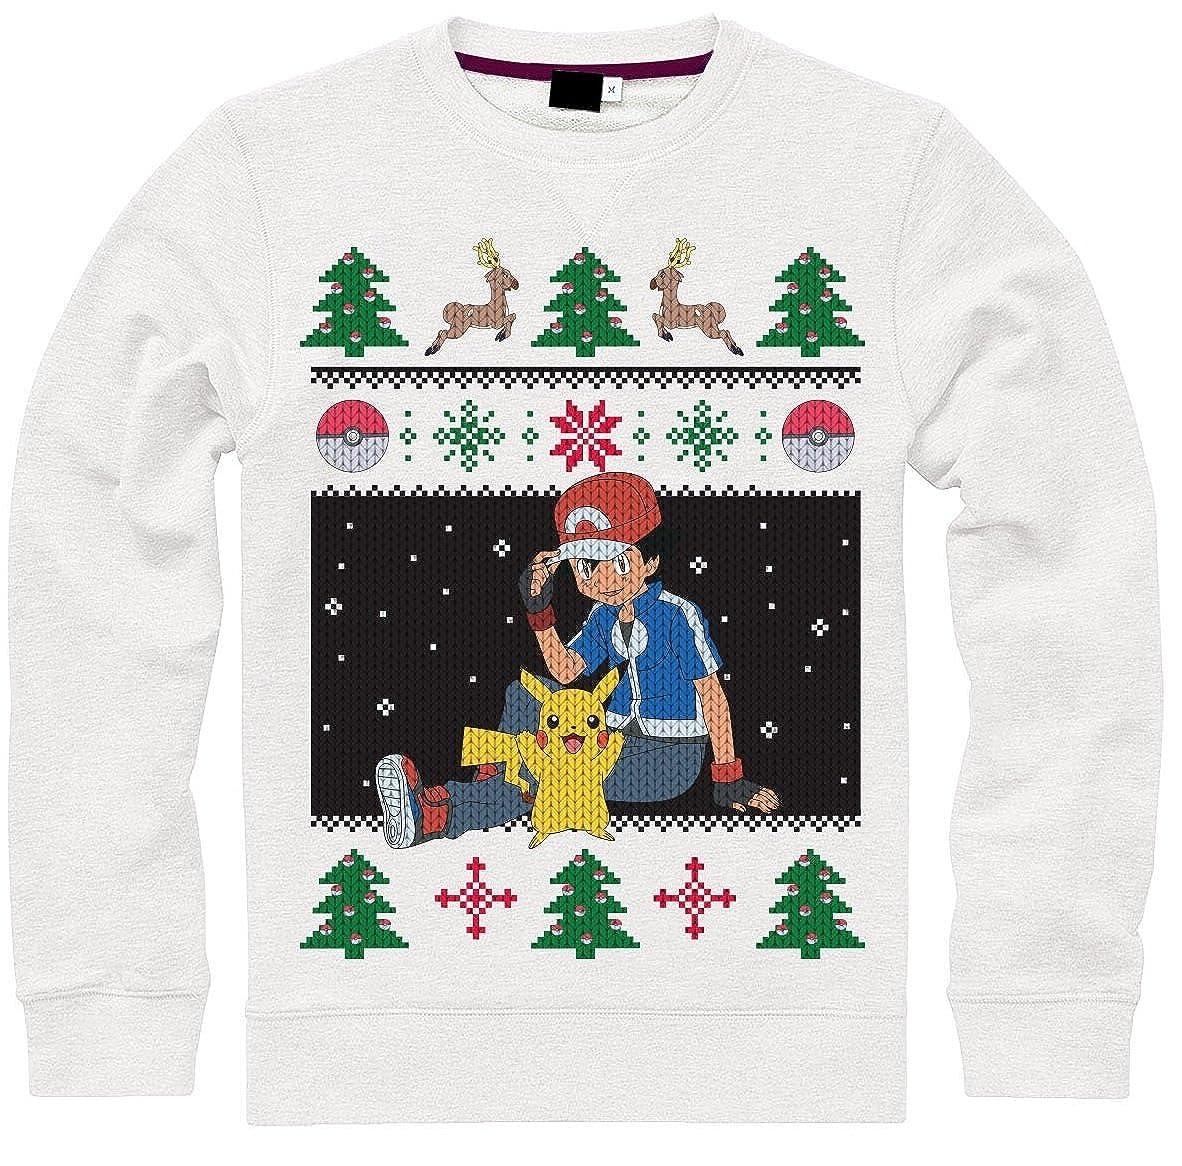 Pokémon Men's Ash & Pikachu Christmas Jumper   Large   White SW504572POK-L